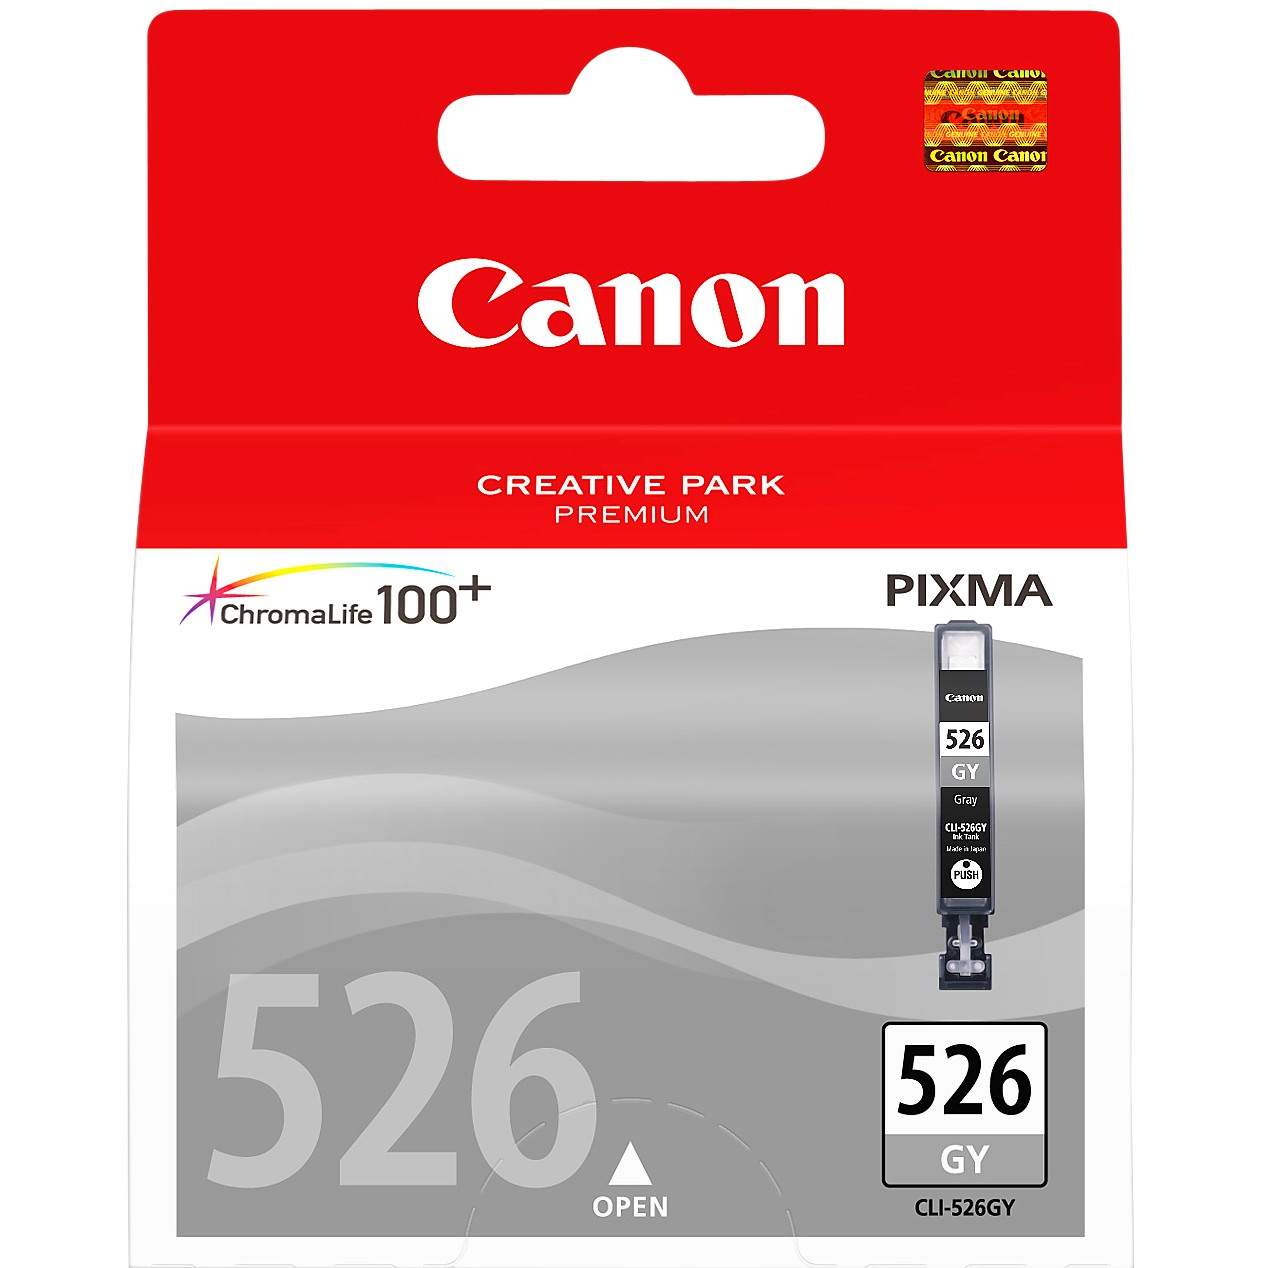 Canon PIXMA CLI-526GY Inkjet Cartridge